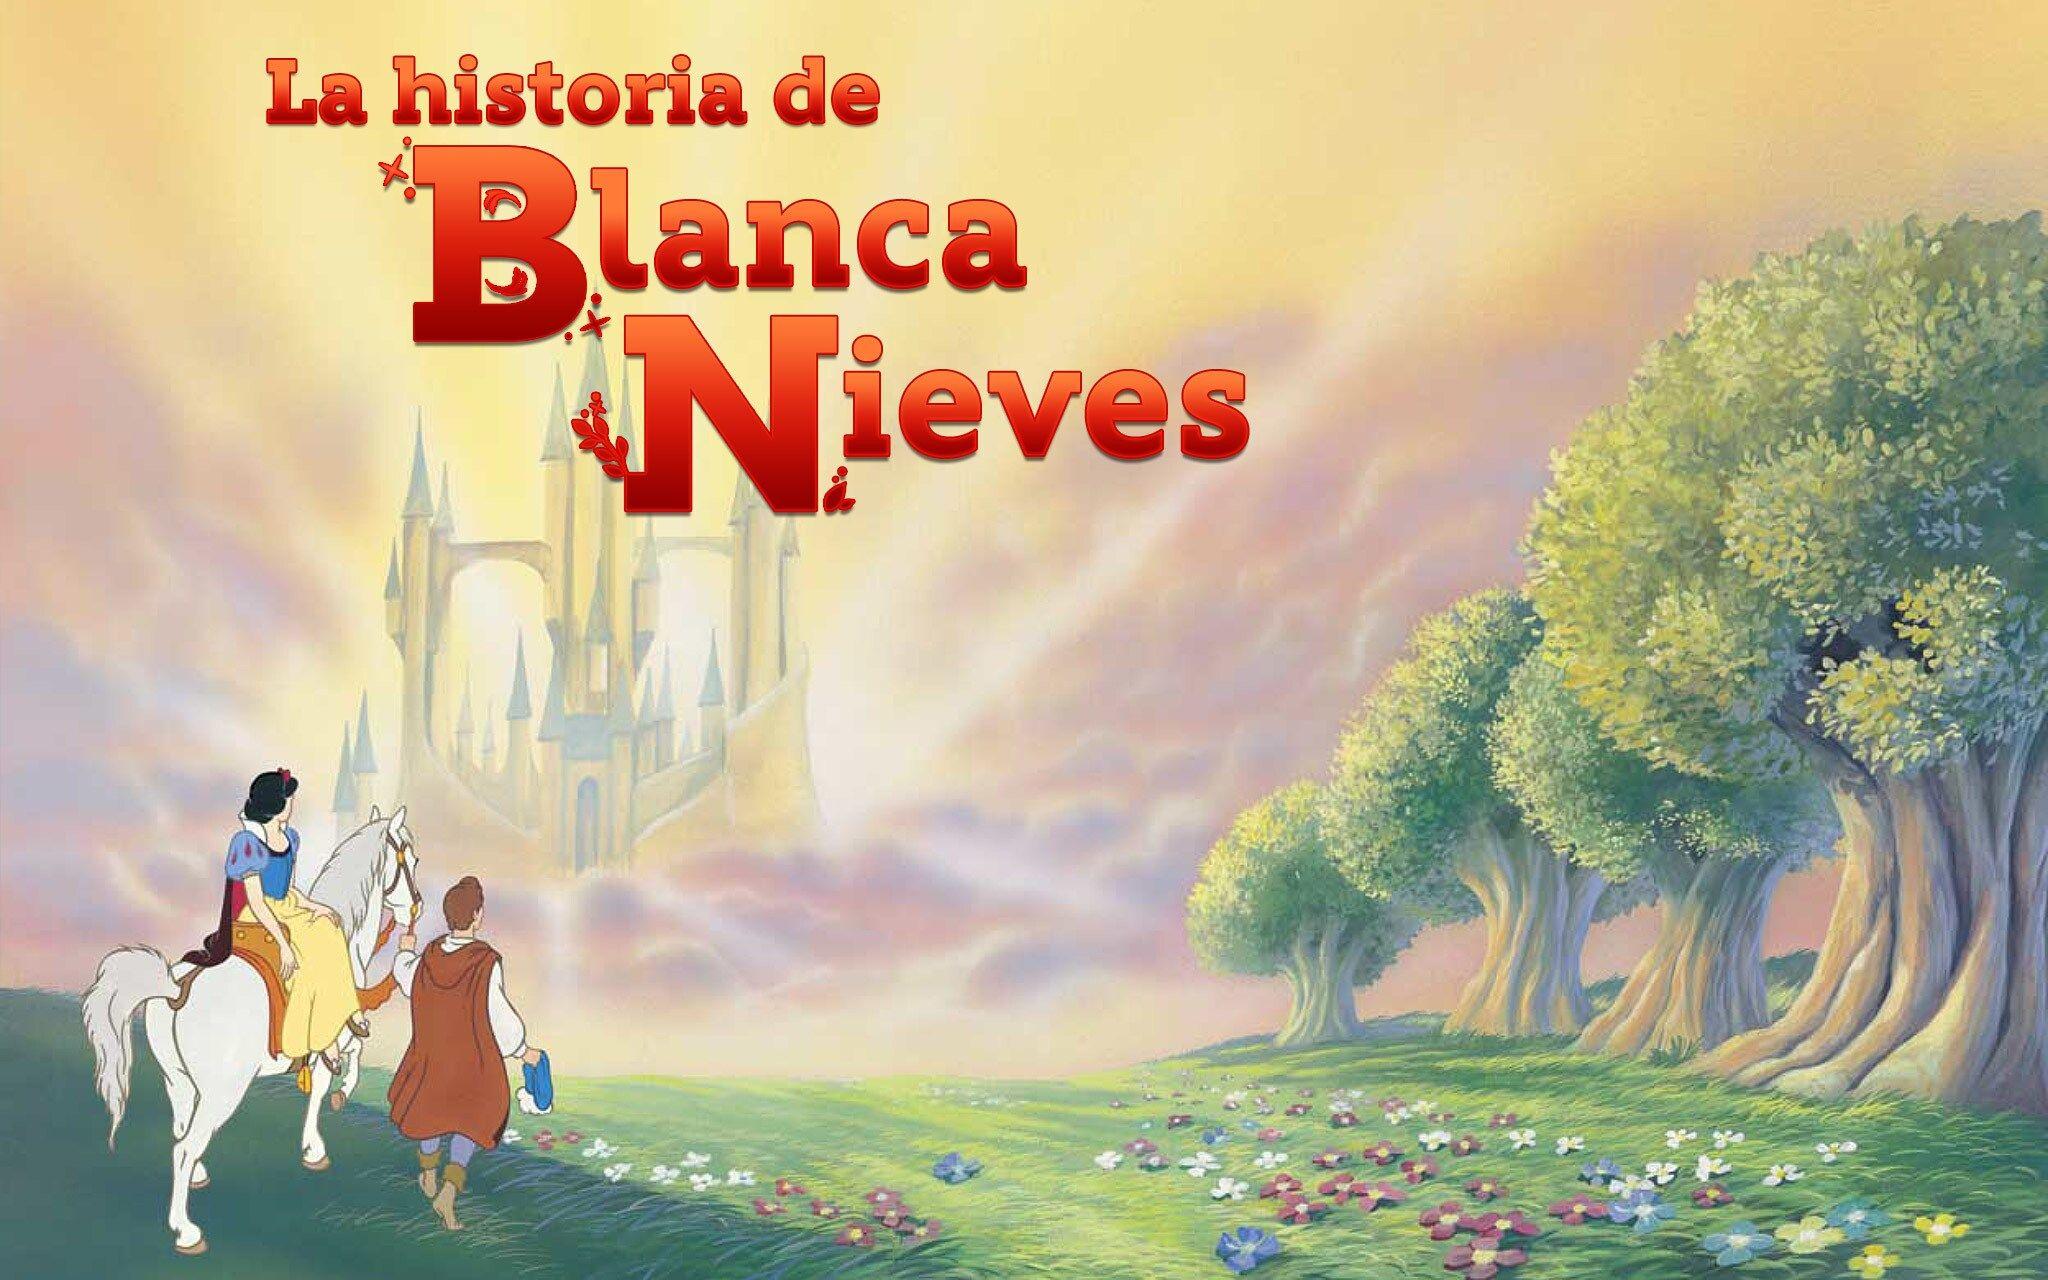 Cuentos De Princesas La Historia De Blanca Nieves Disney Ajá Disney Princess Books Snow White Cartoon Drawings Of Animals